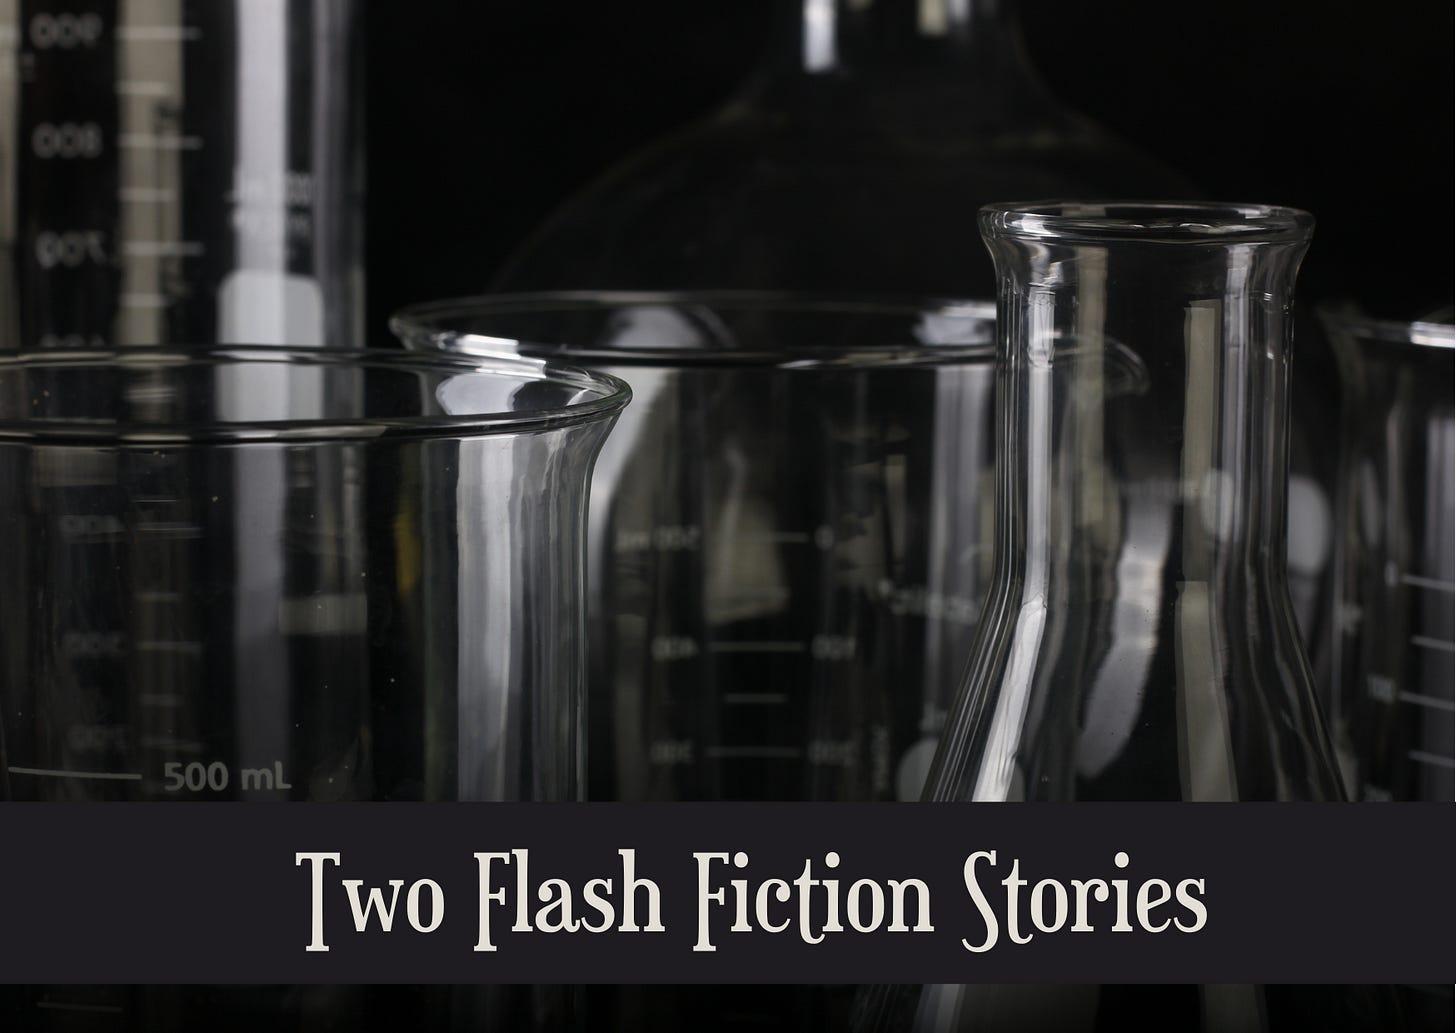 header image showing glass laboratory equipment